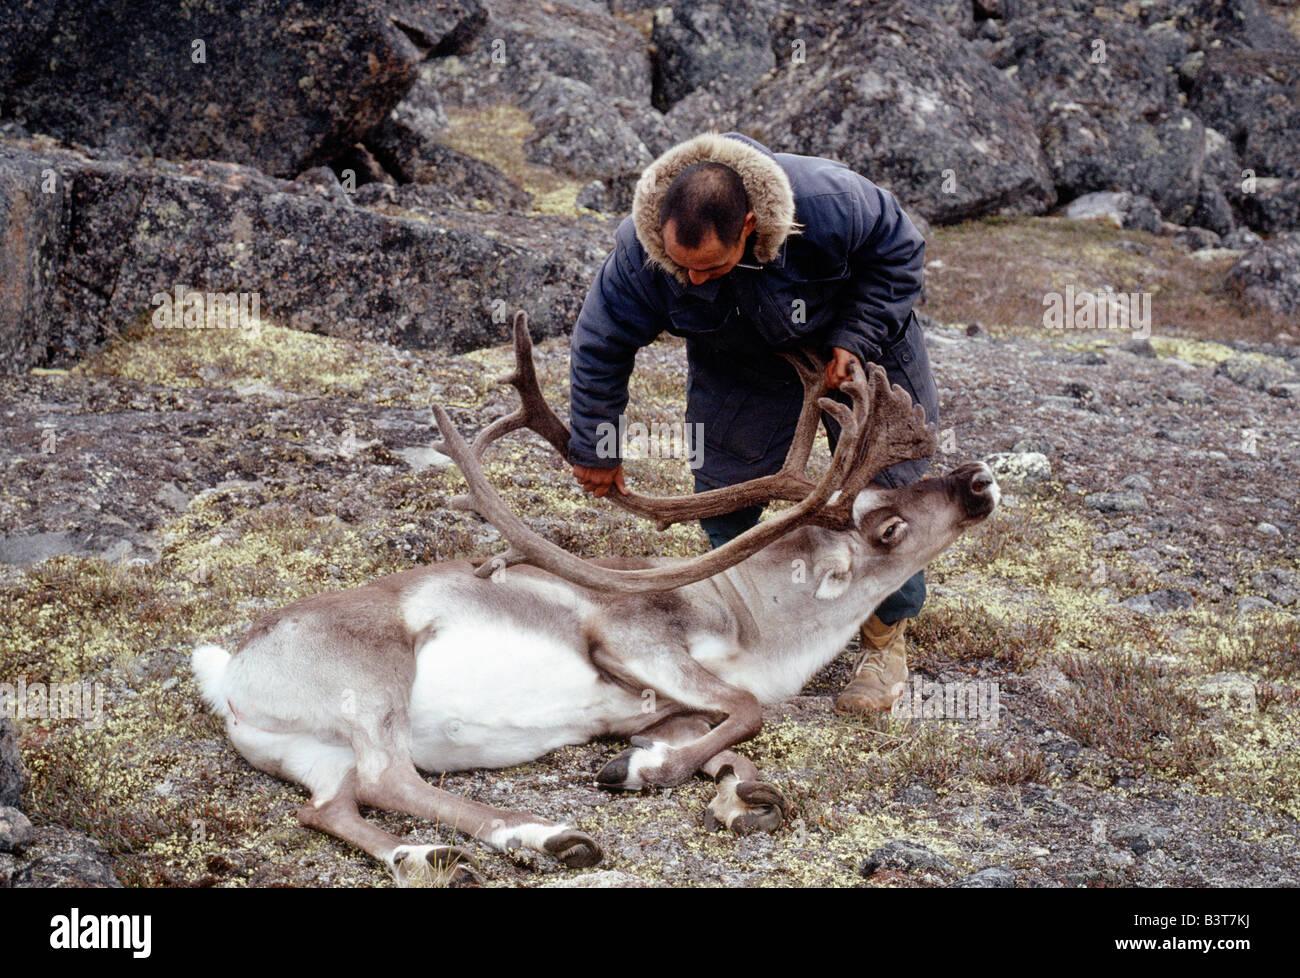 Inuit Eskimo Man And A Freshly Killed Caribou Baffin Island Nunavut Canada